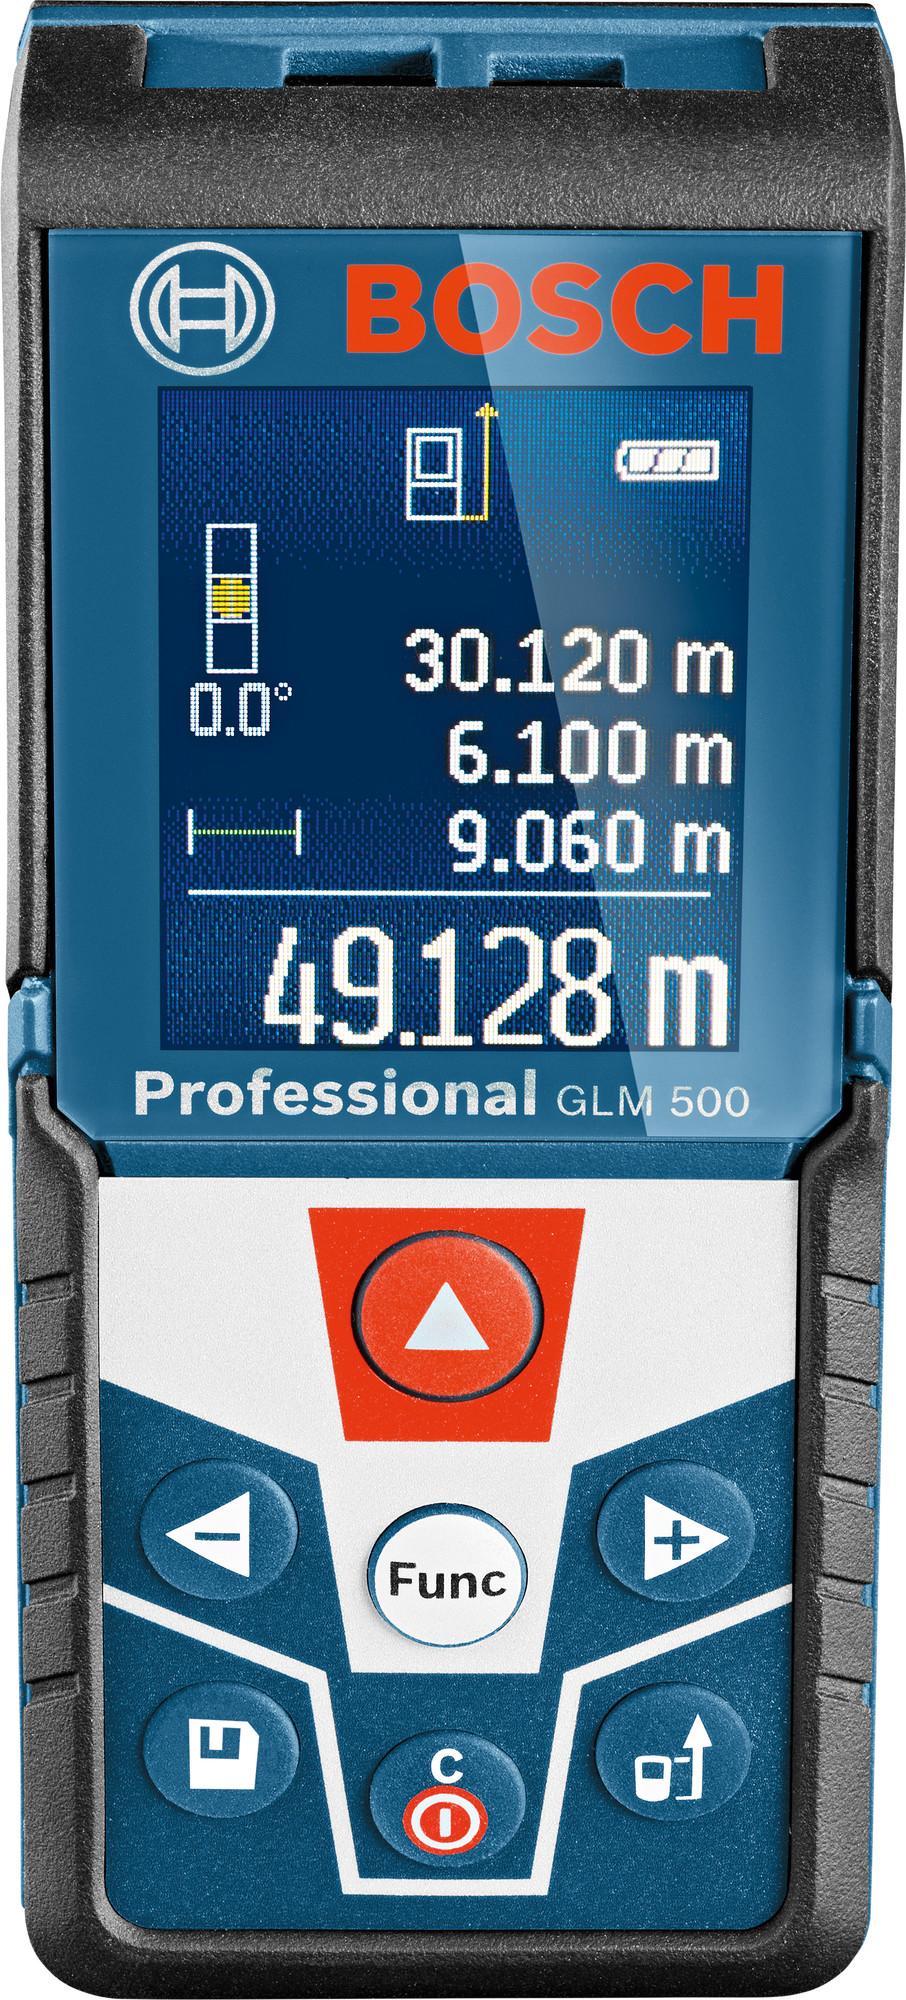 Infrarot Entfernungsmesser Bosch : Laser entfernungsmesser bosch glm c professional · jetzt